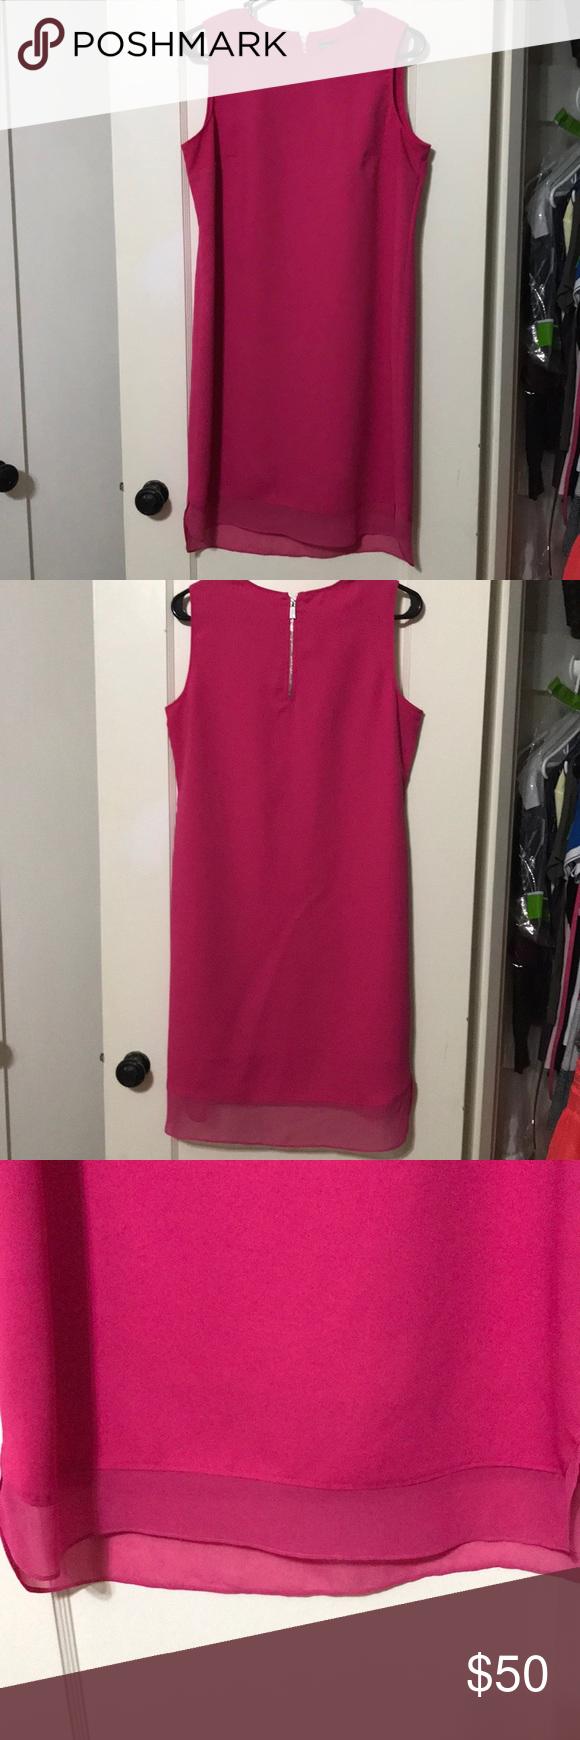 Vince Camuto Hot Pink Dress Hot Pink Dresses Pink Dress Dresses [ 1740 x 580 Pixel ]